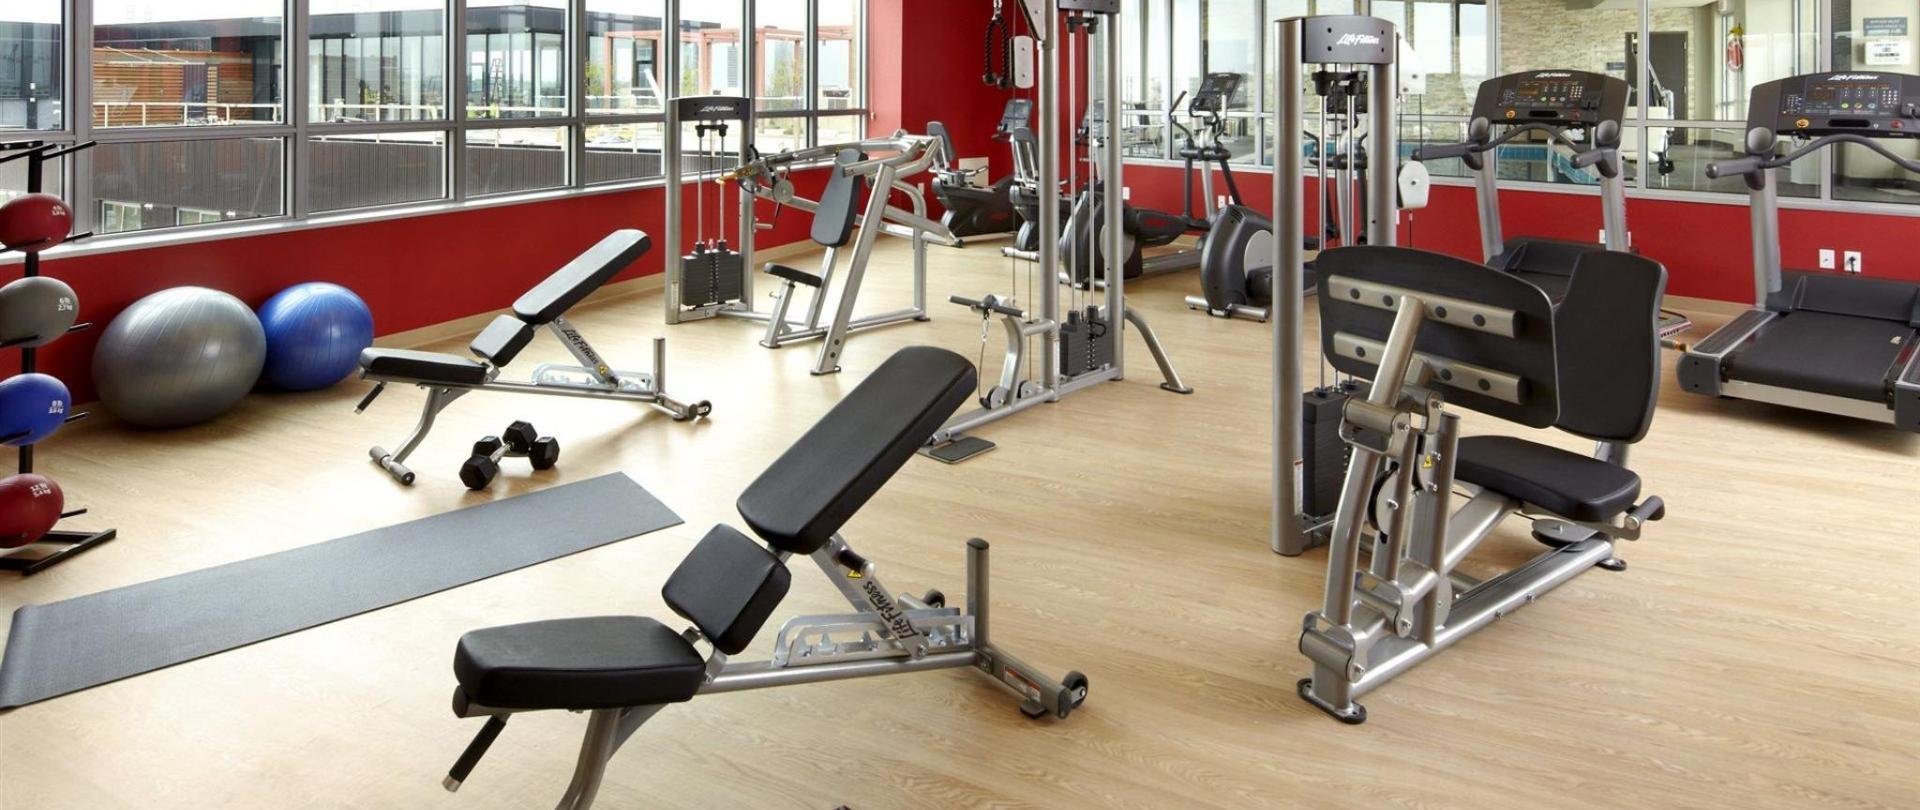 cam-dc-fitness-20141.jpg